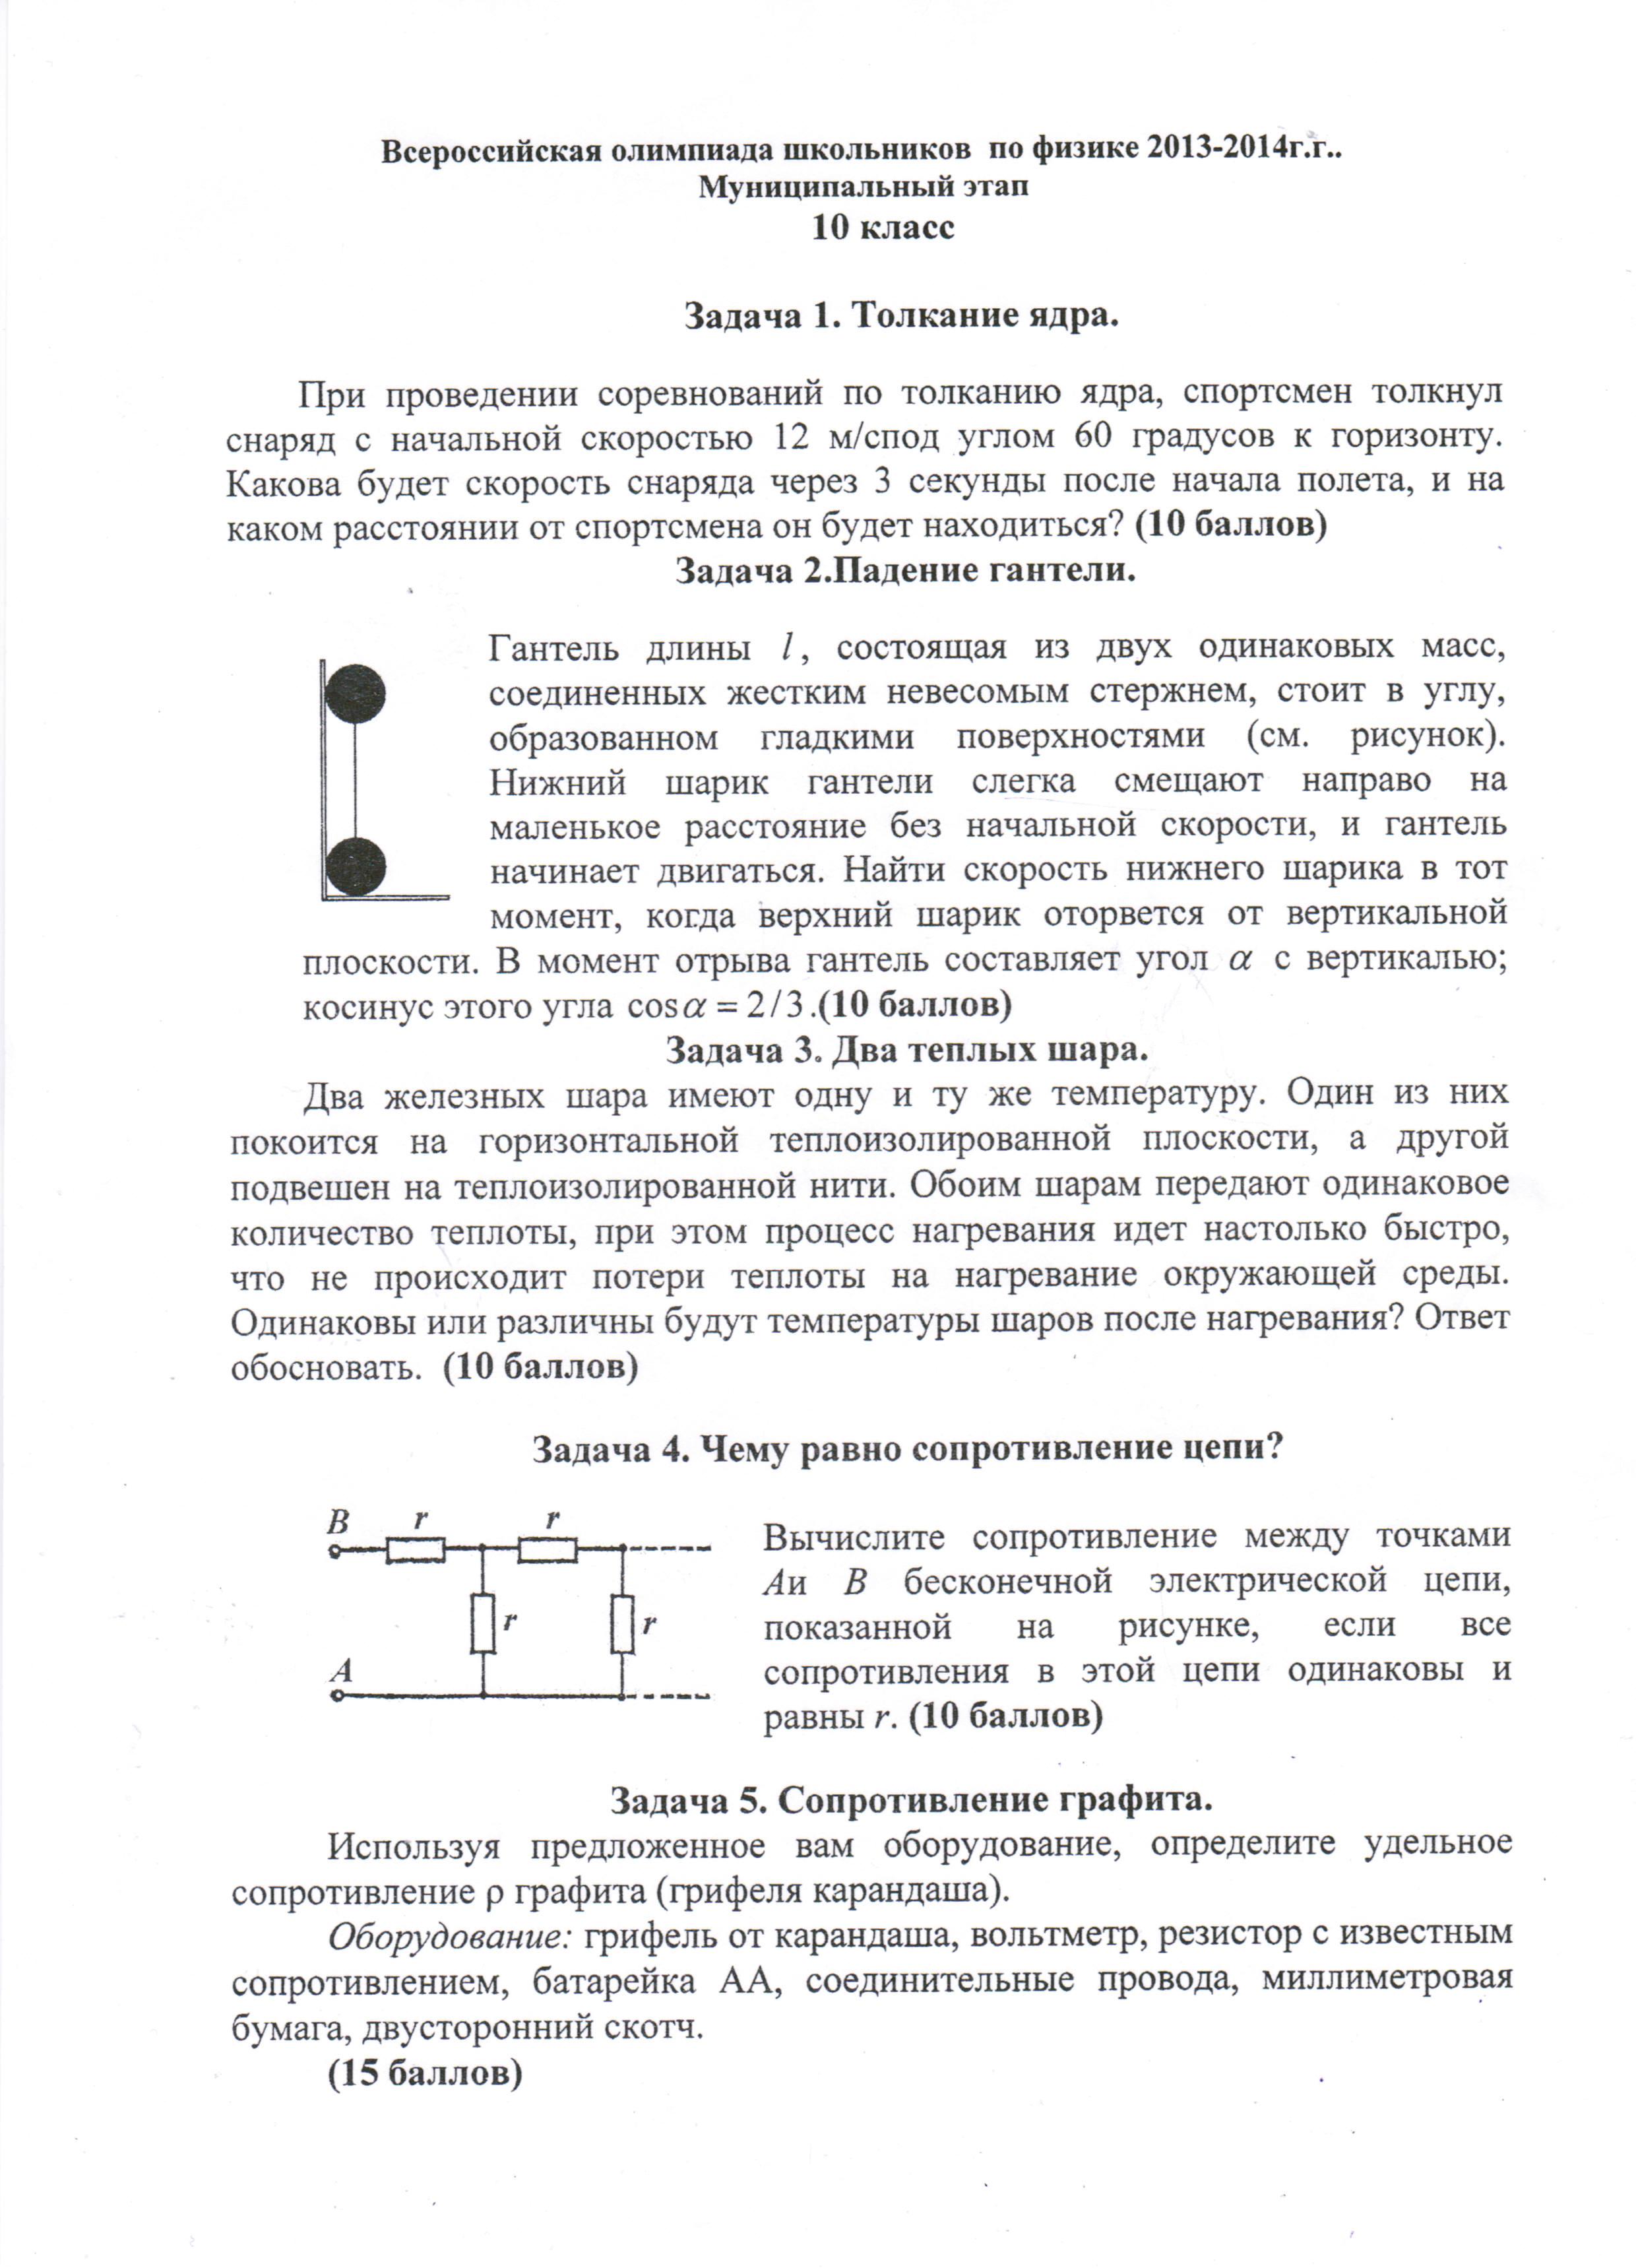 Муниципальная олимпиада по физике 8 класс